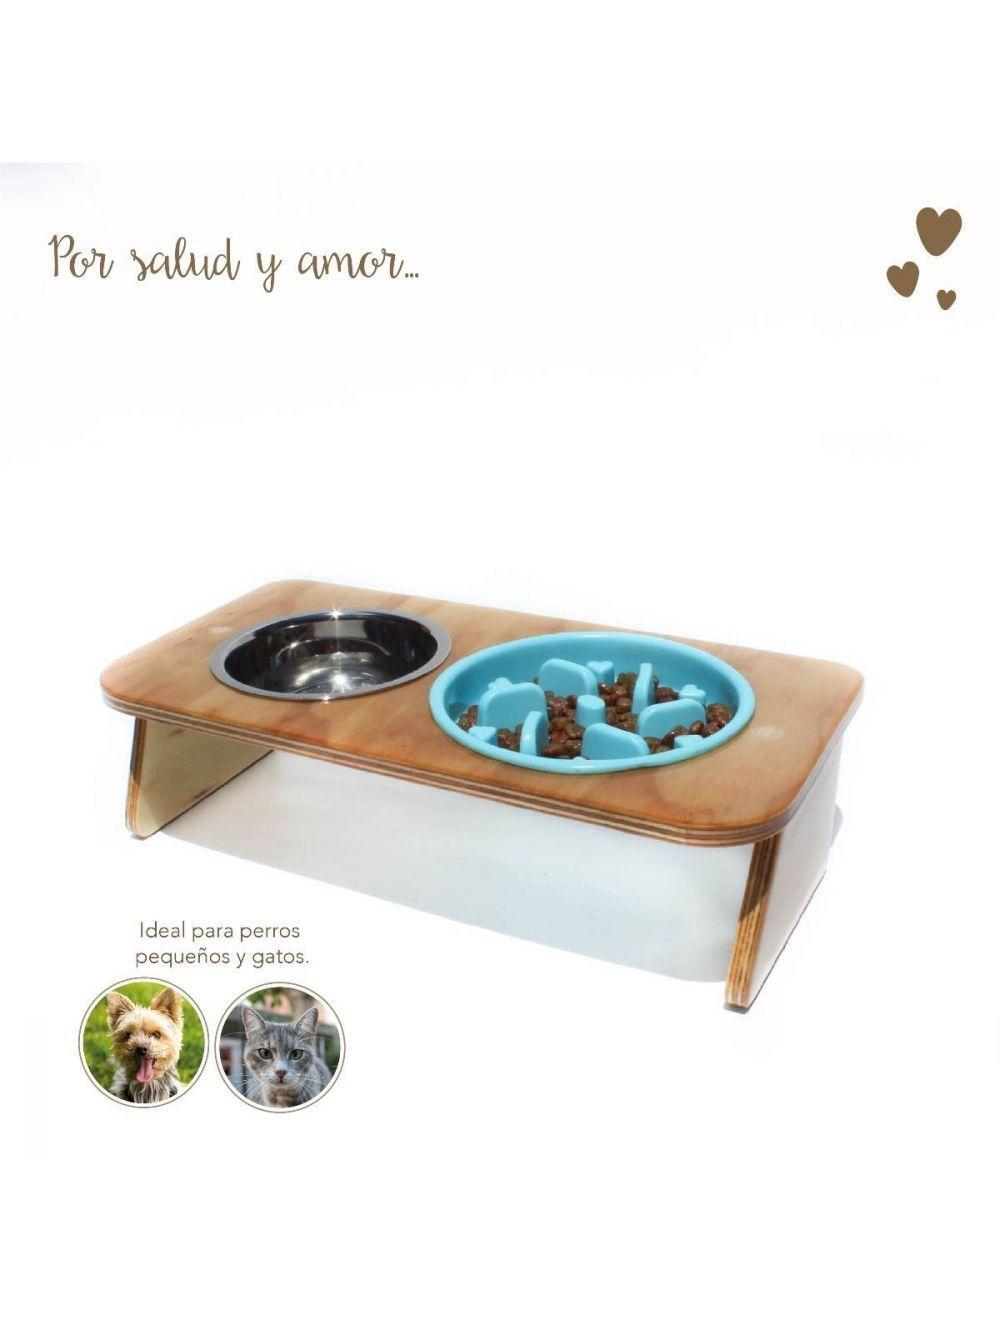 Comedero Plato Antireflujo Mandi Pets Elevado Azul Pequeño